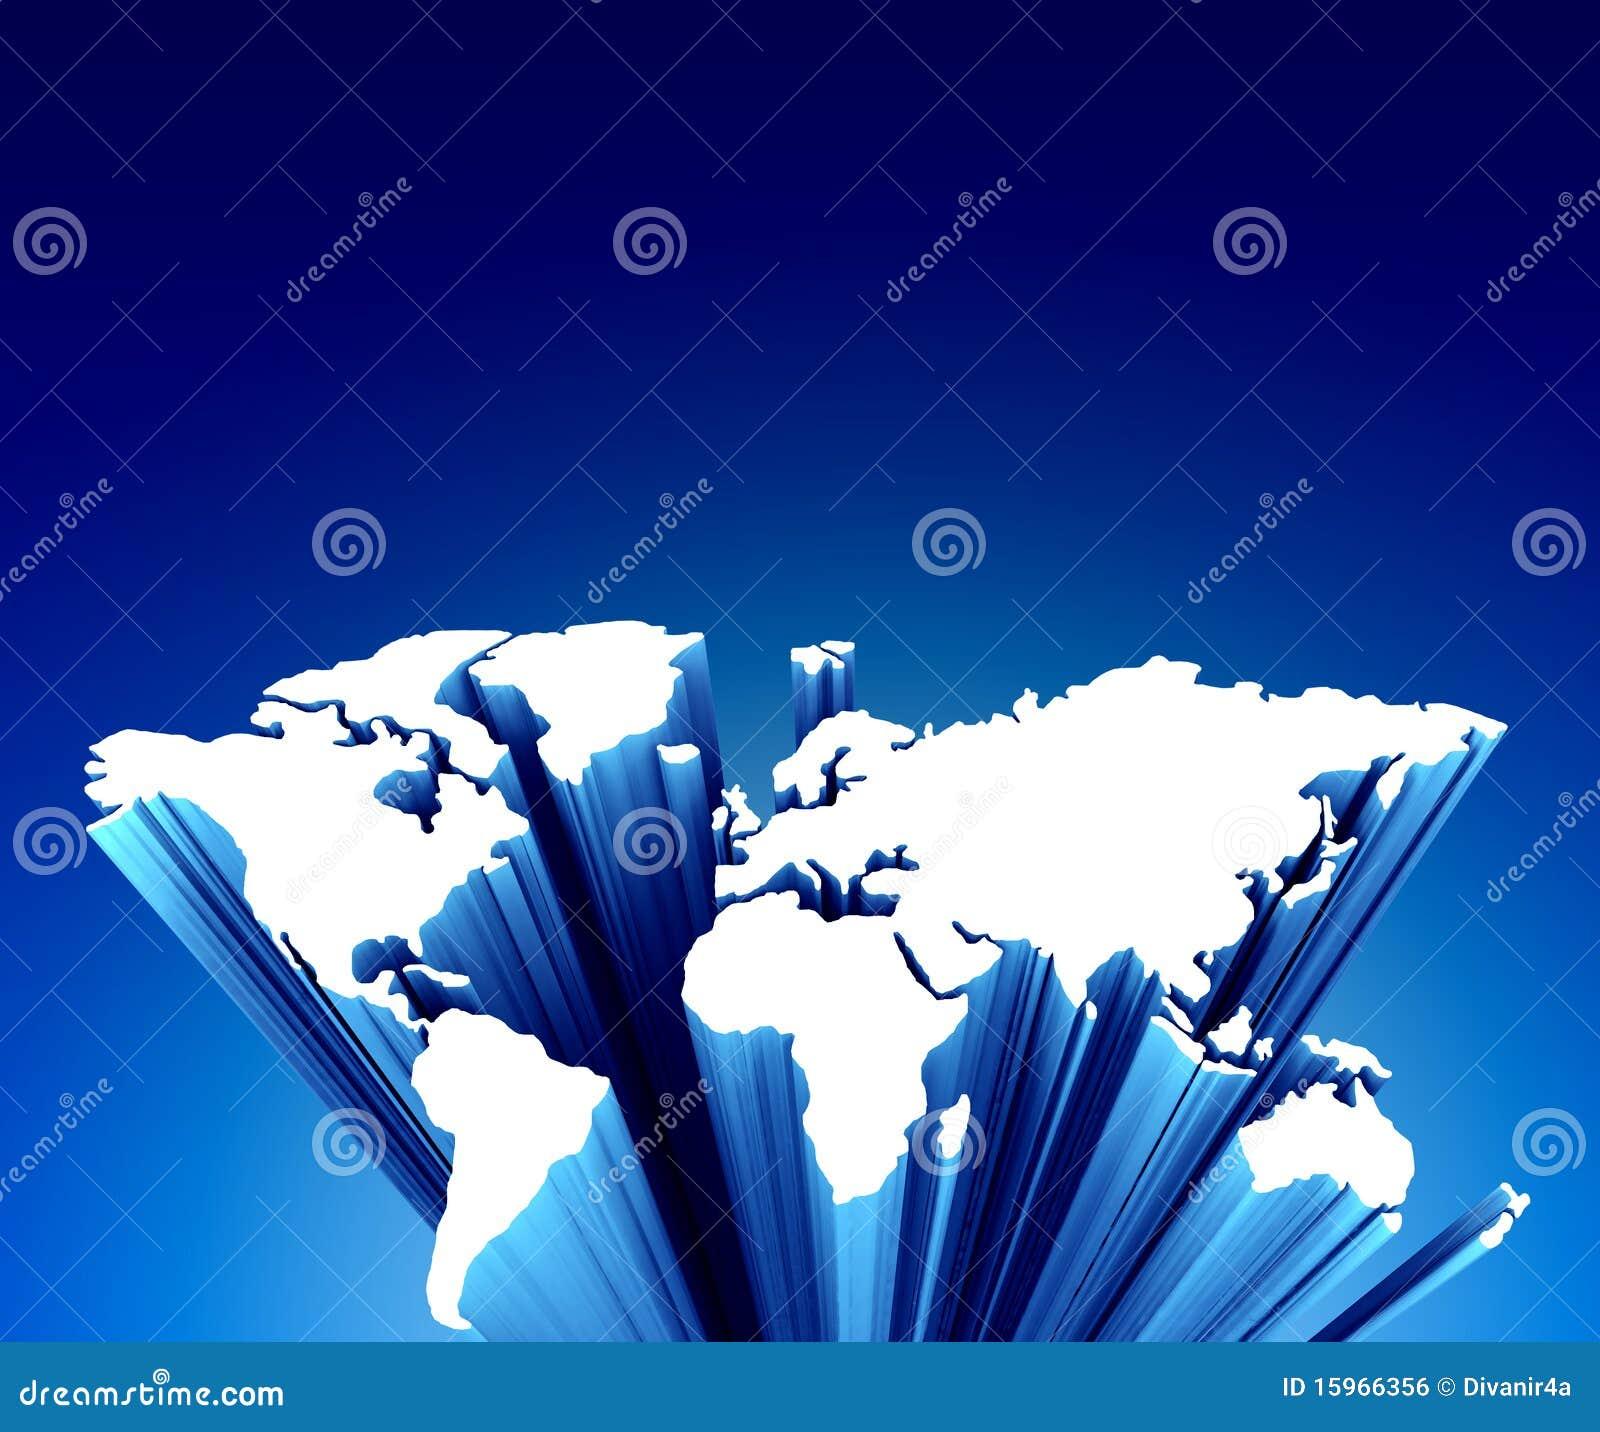 Weltkarte auf Blau